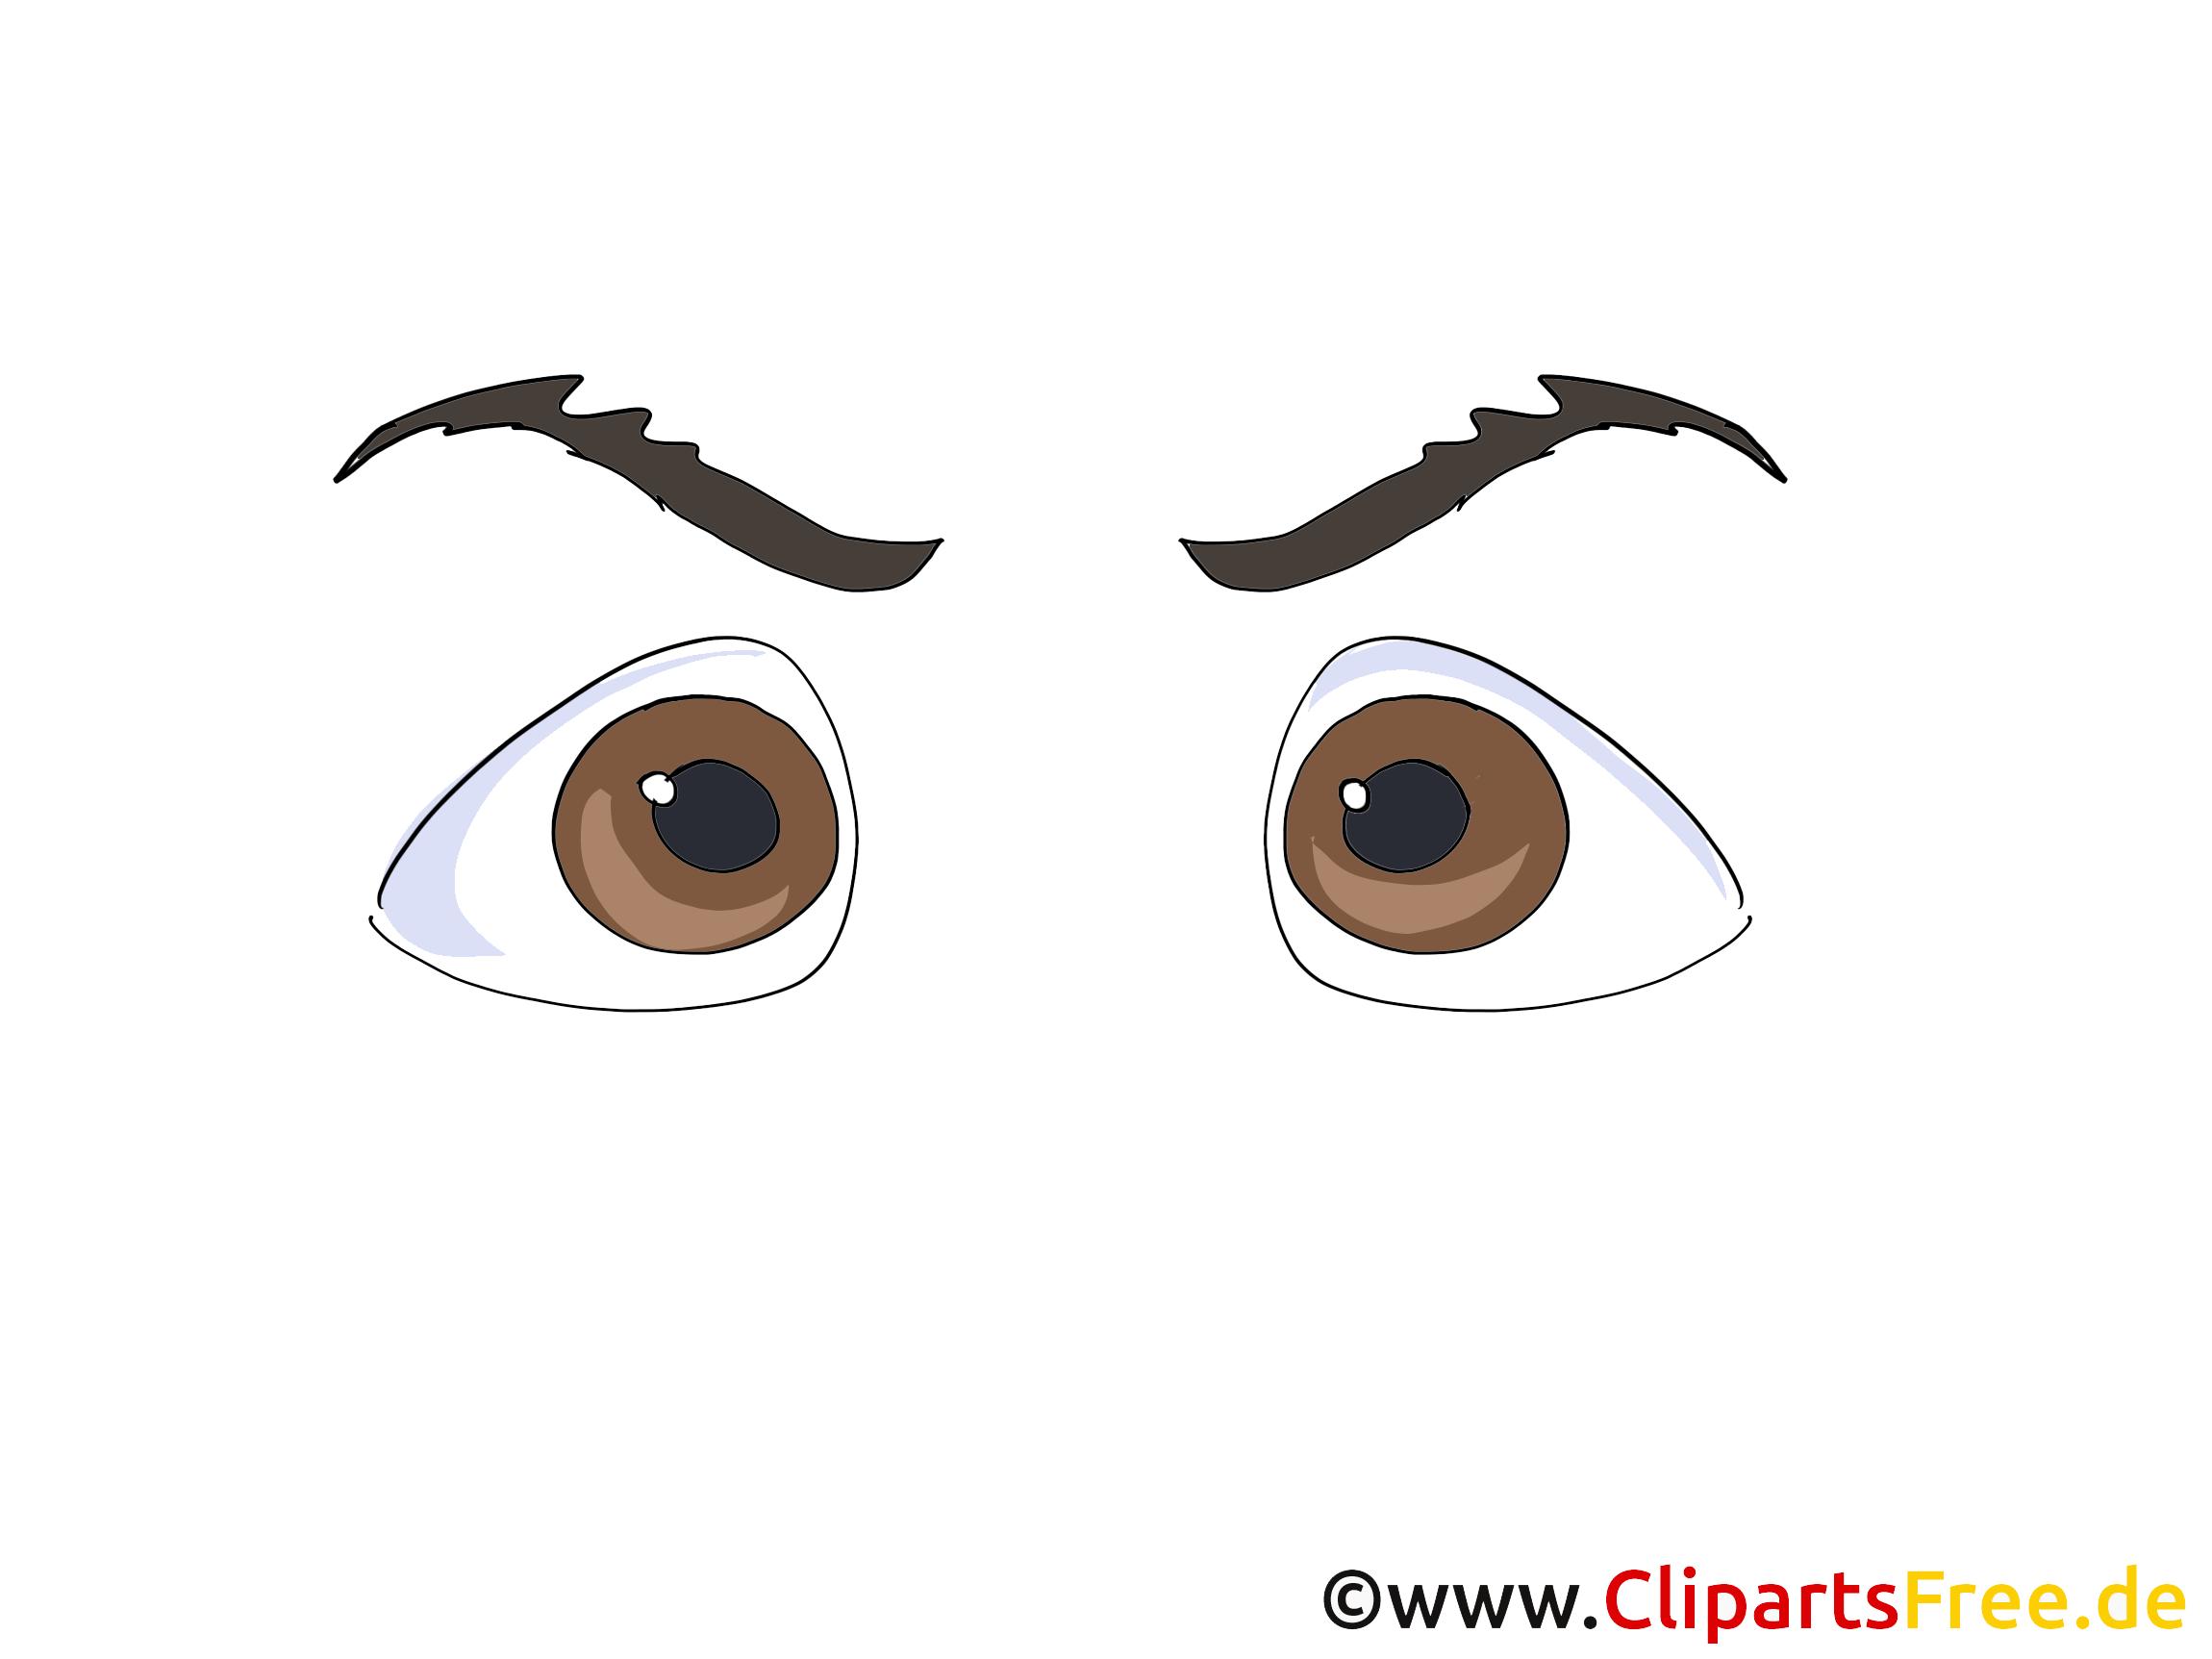 Brunes yeux image – Dessin images cliparts